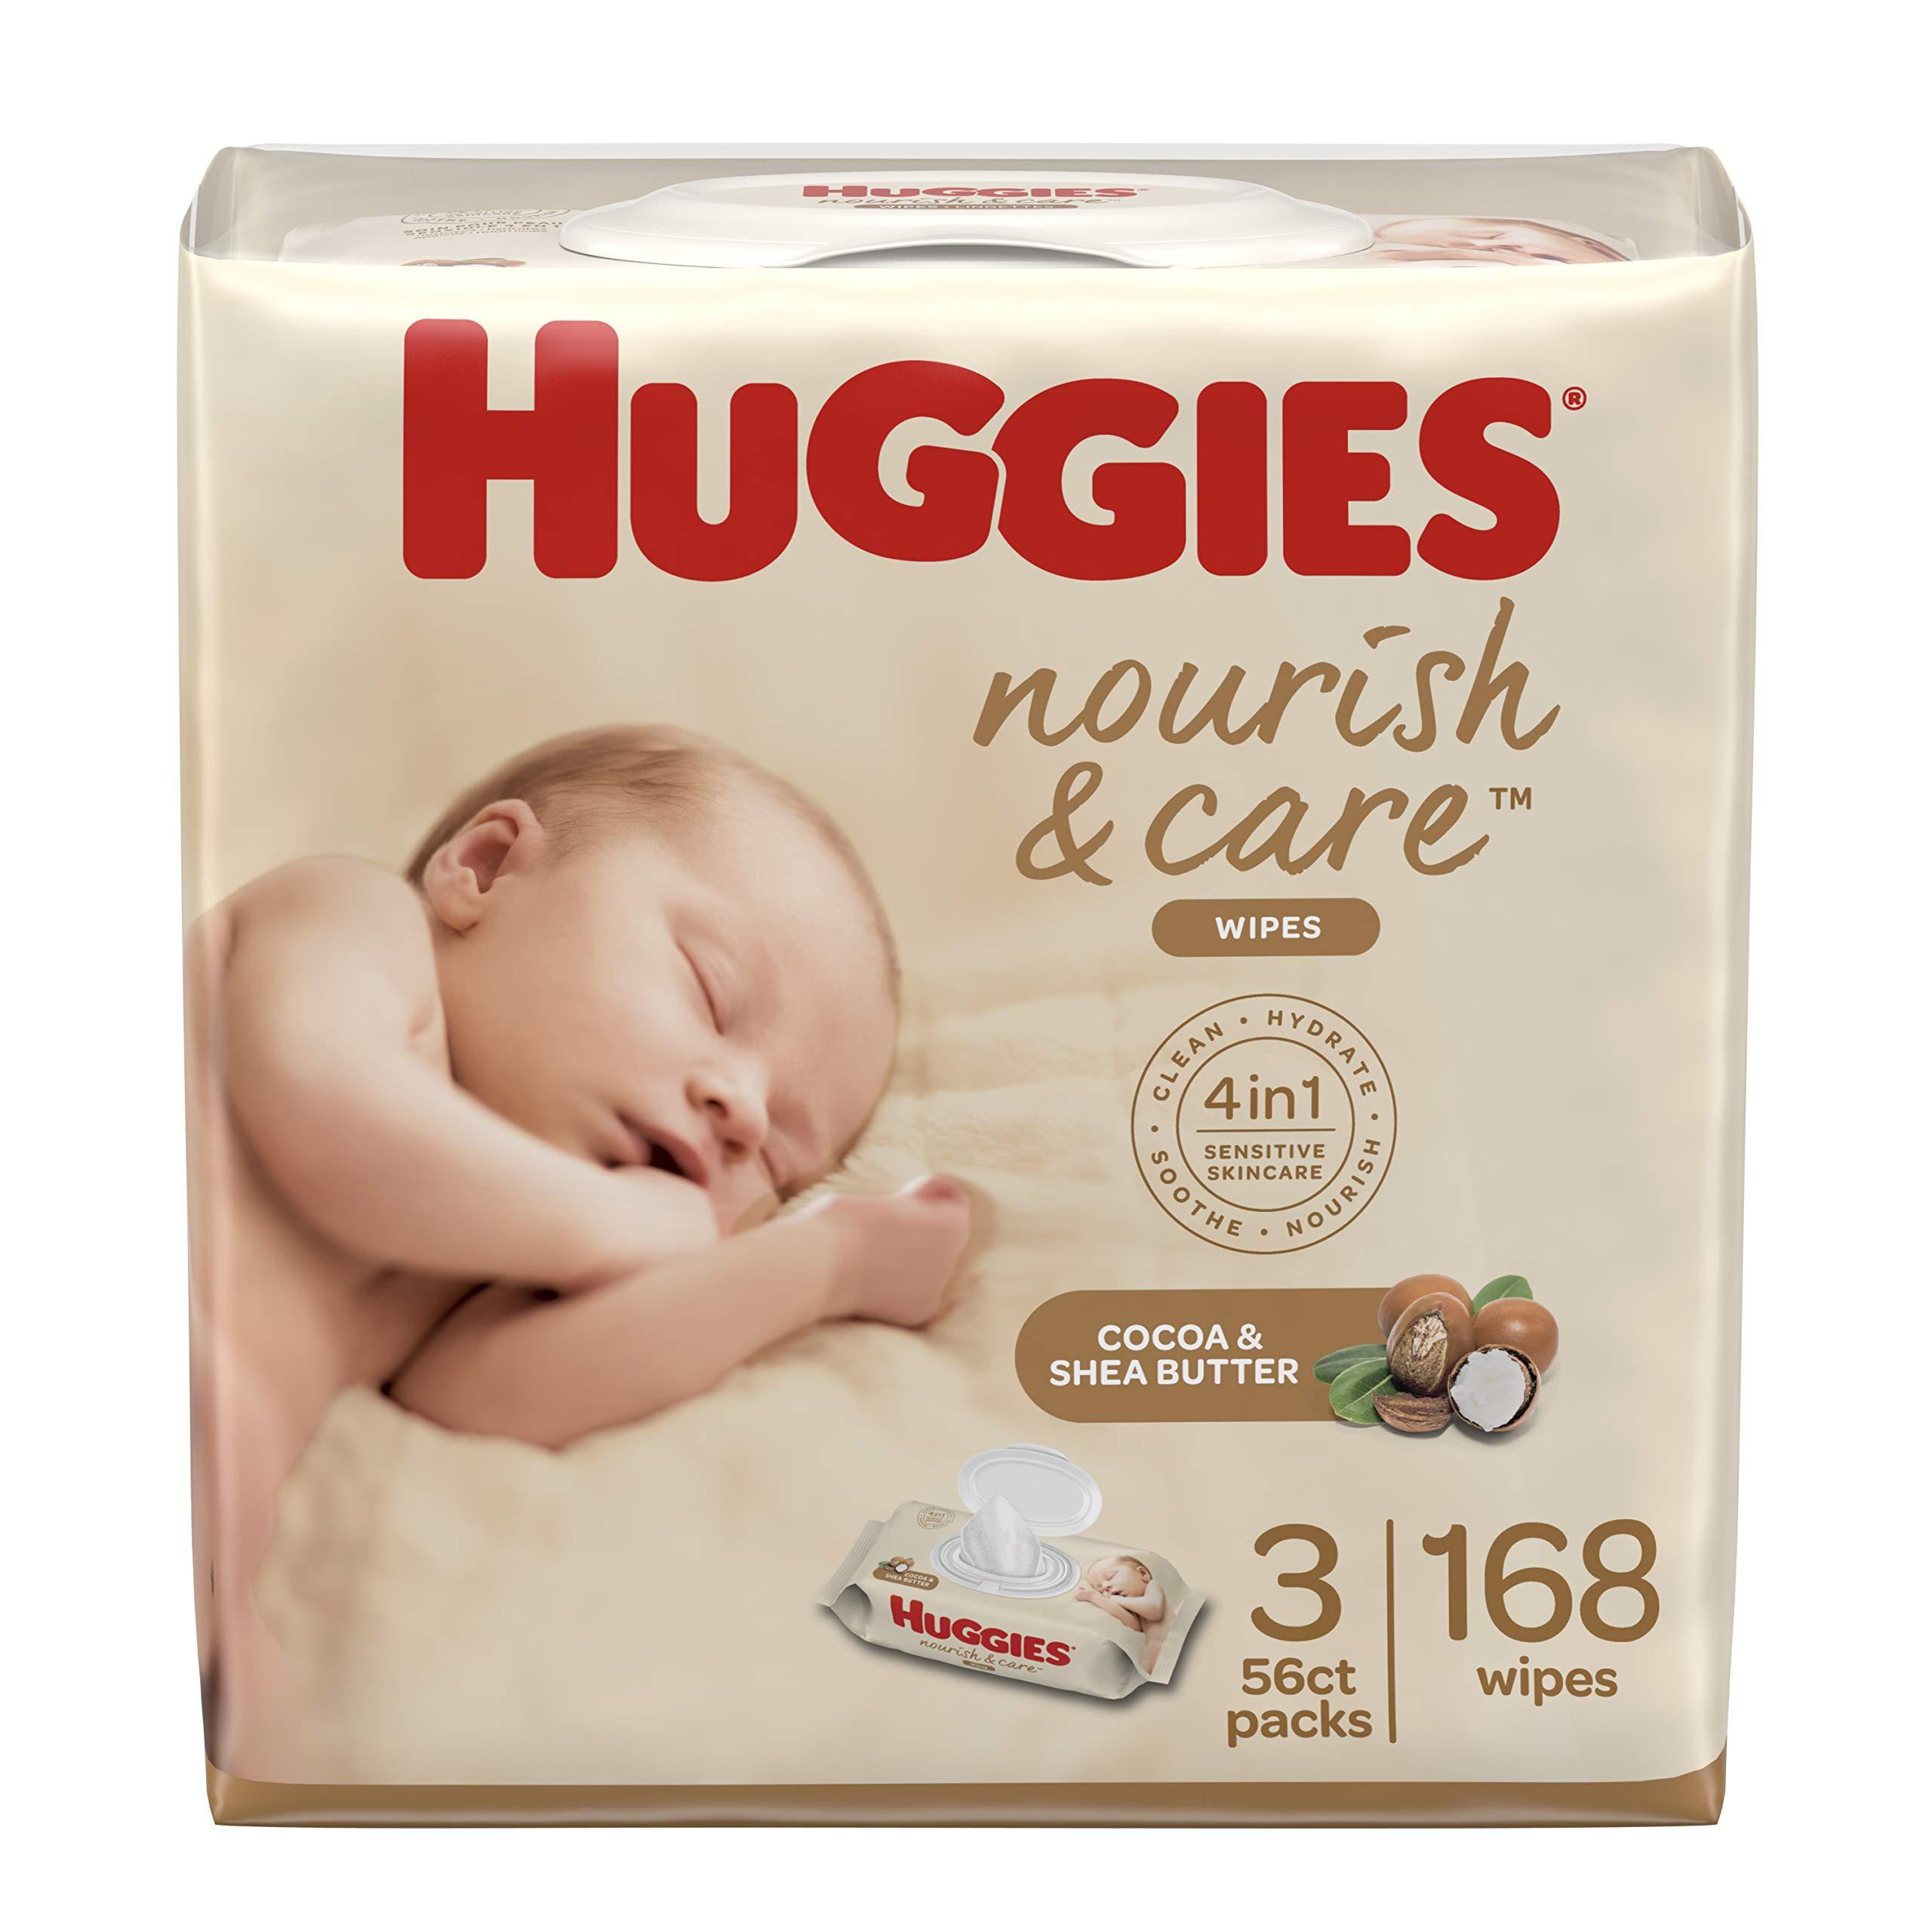 Huggies Nourish & Care Scented Baby Wipes, 3 Flip-Top Packs (168 Wipes Total)